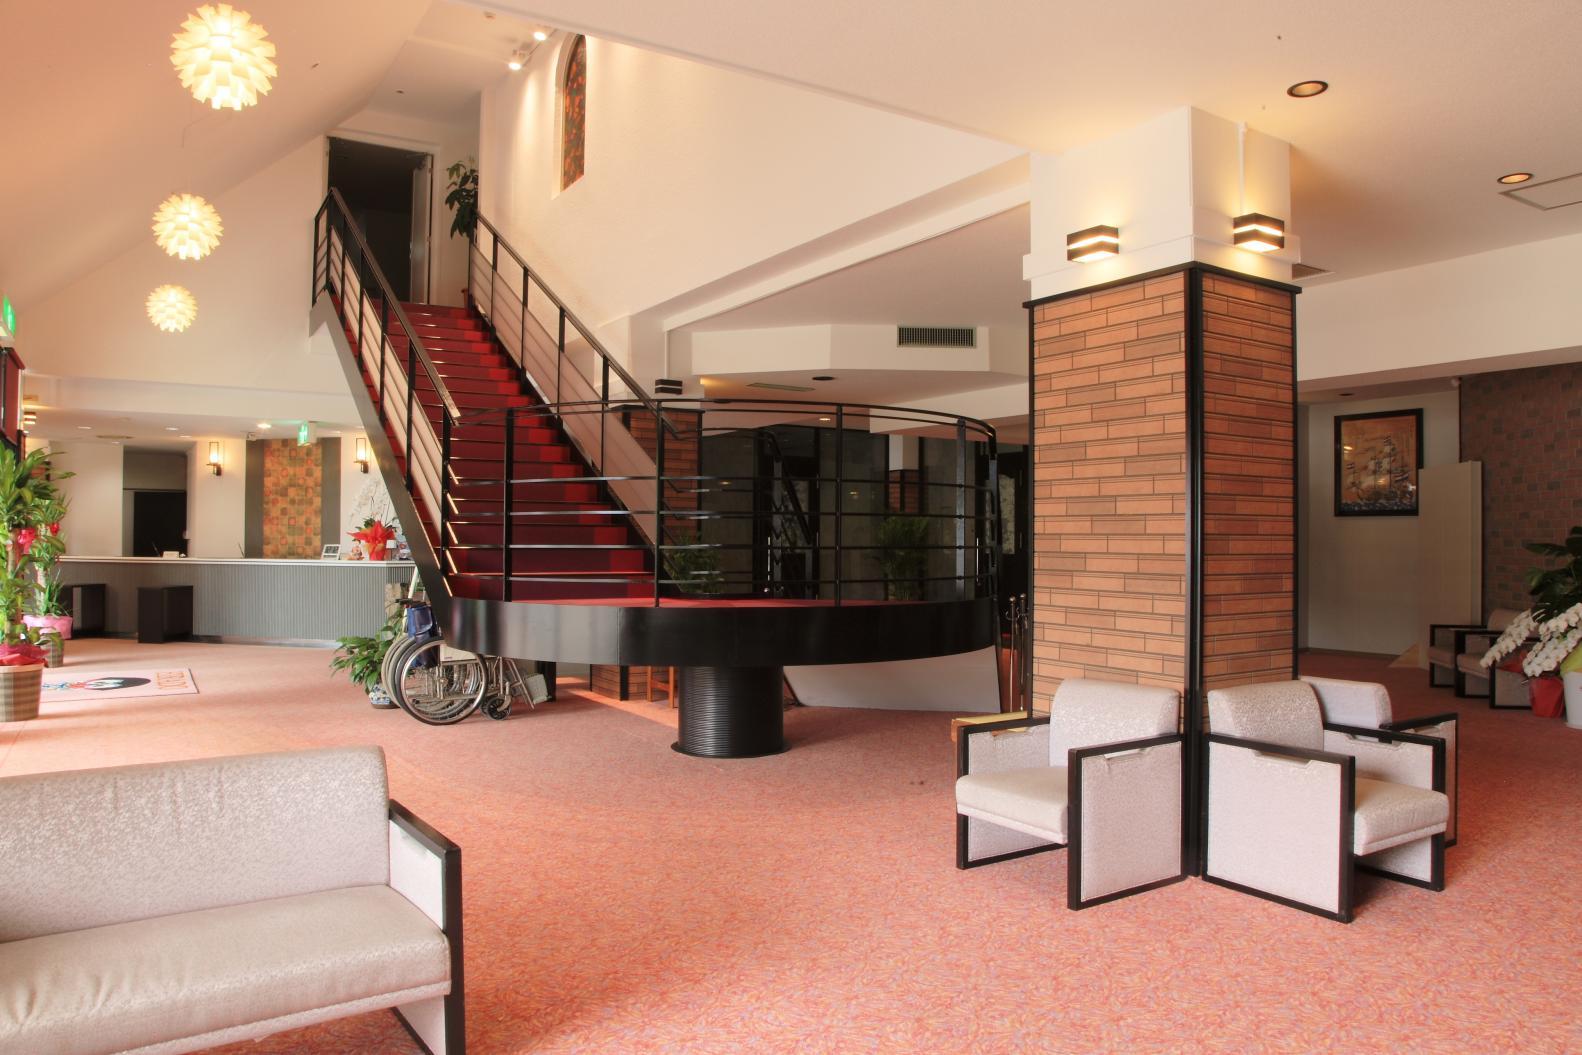 ホテル彩陽WAKIGAWA-1